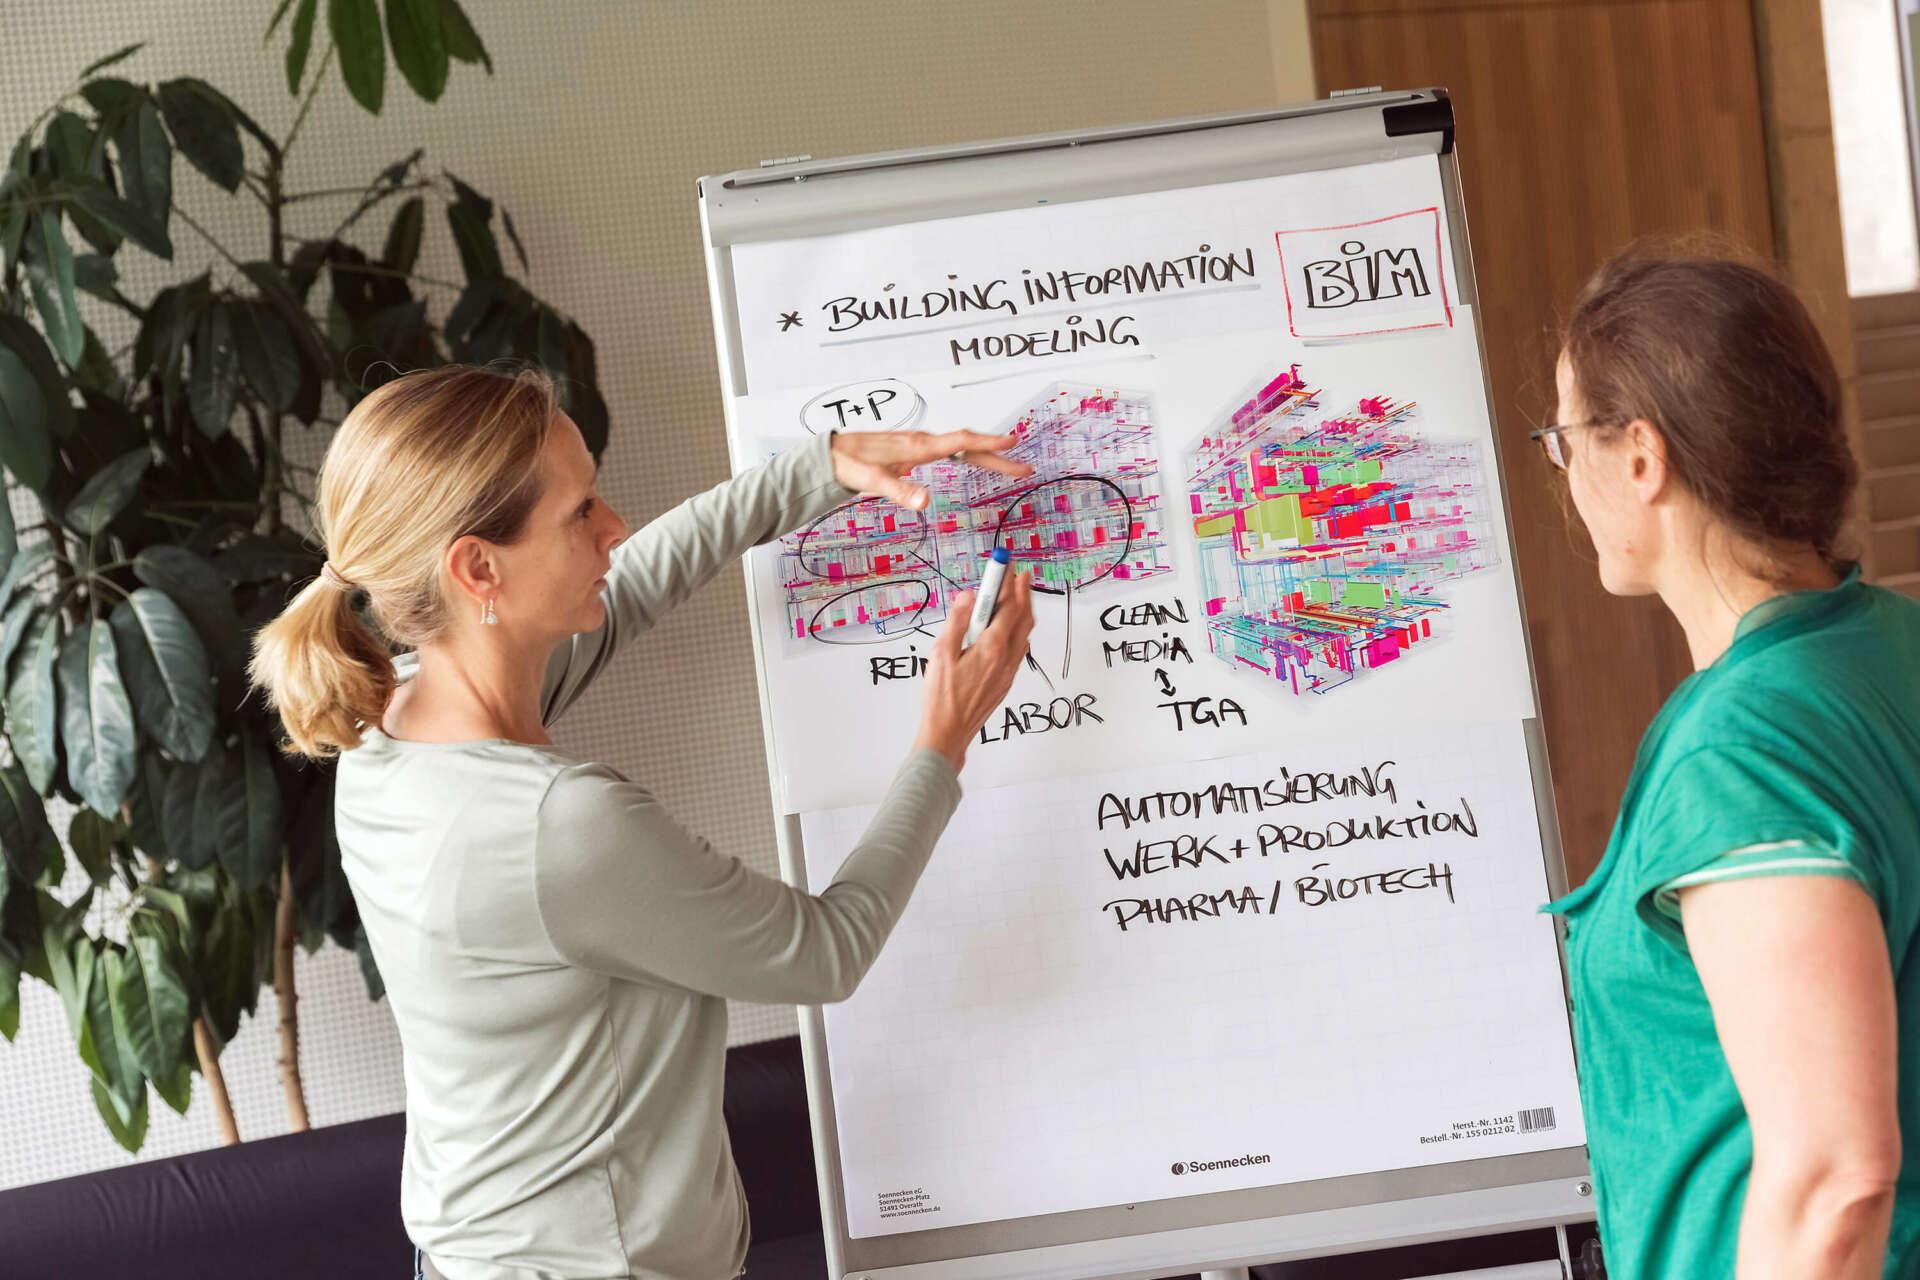 Fachbereich BIM_Building Information Modeling